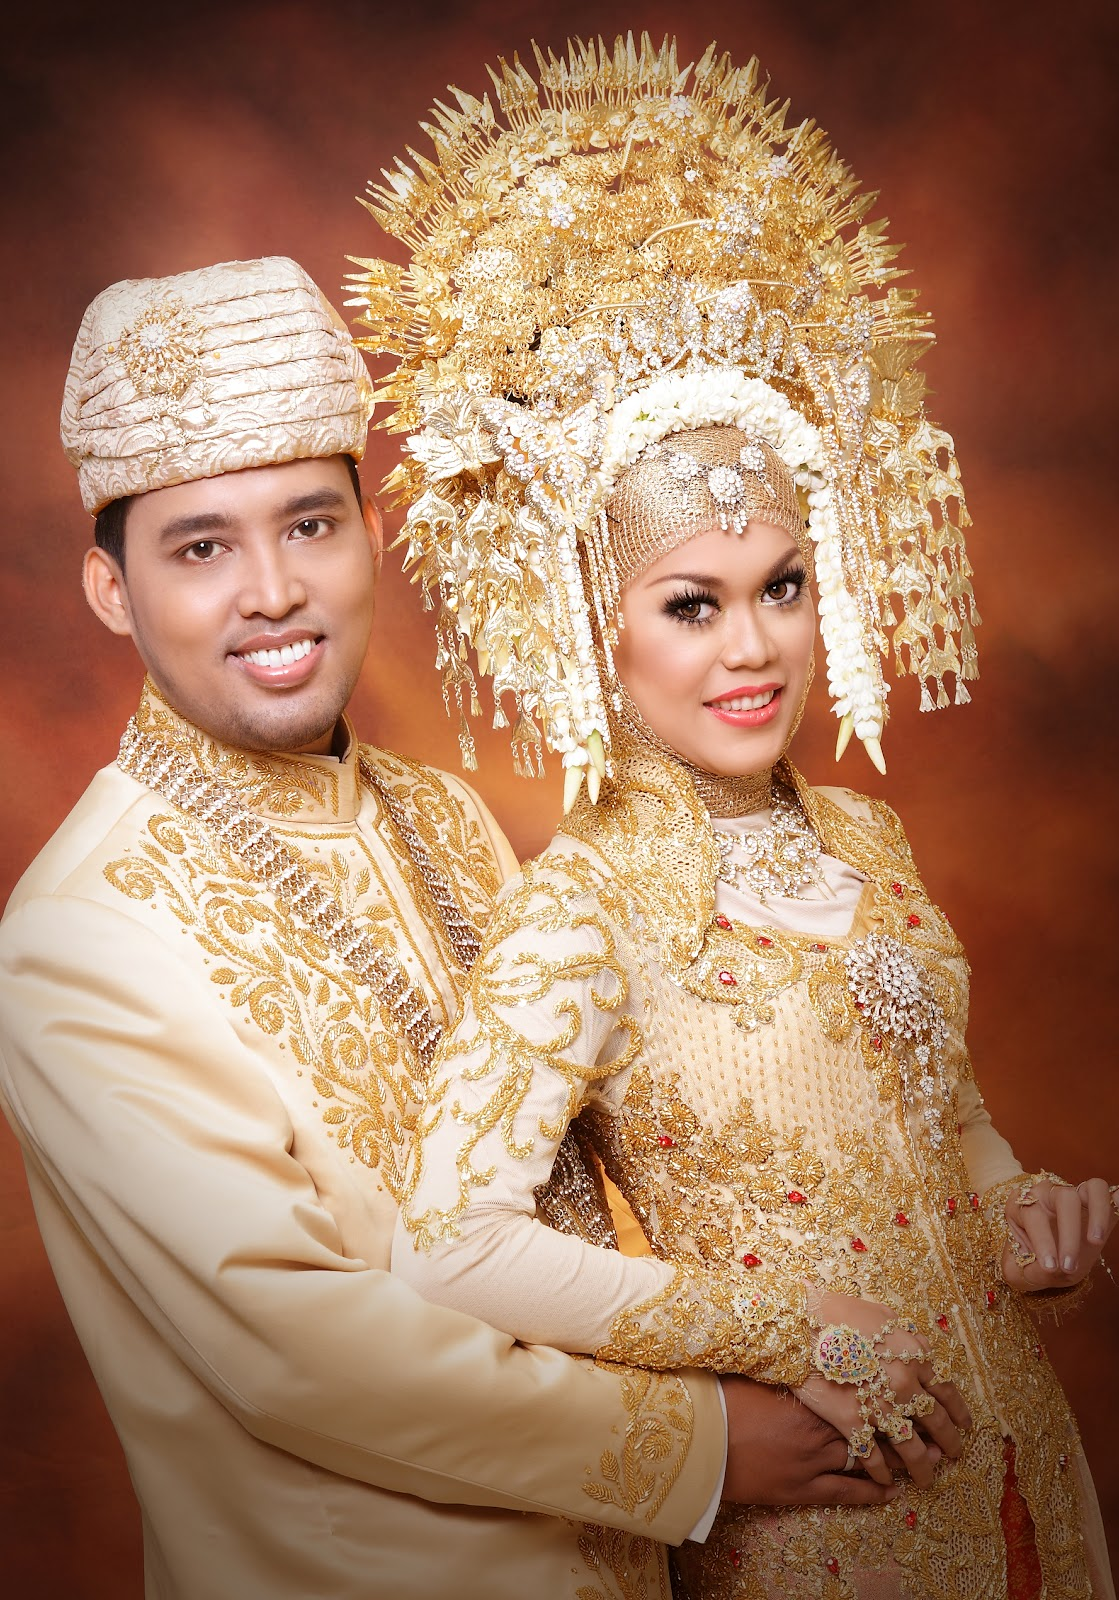 Tata rias pengantin Adat Minang Tata Rias Wajah Pengantin